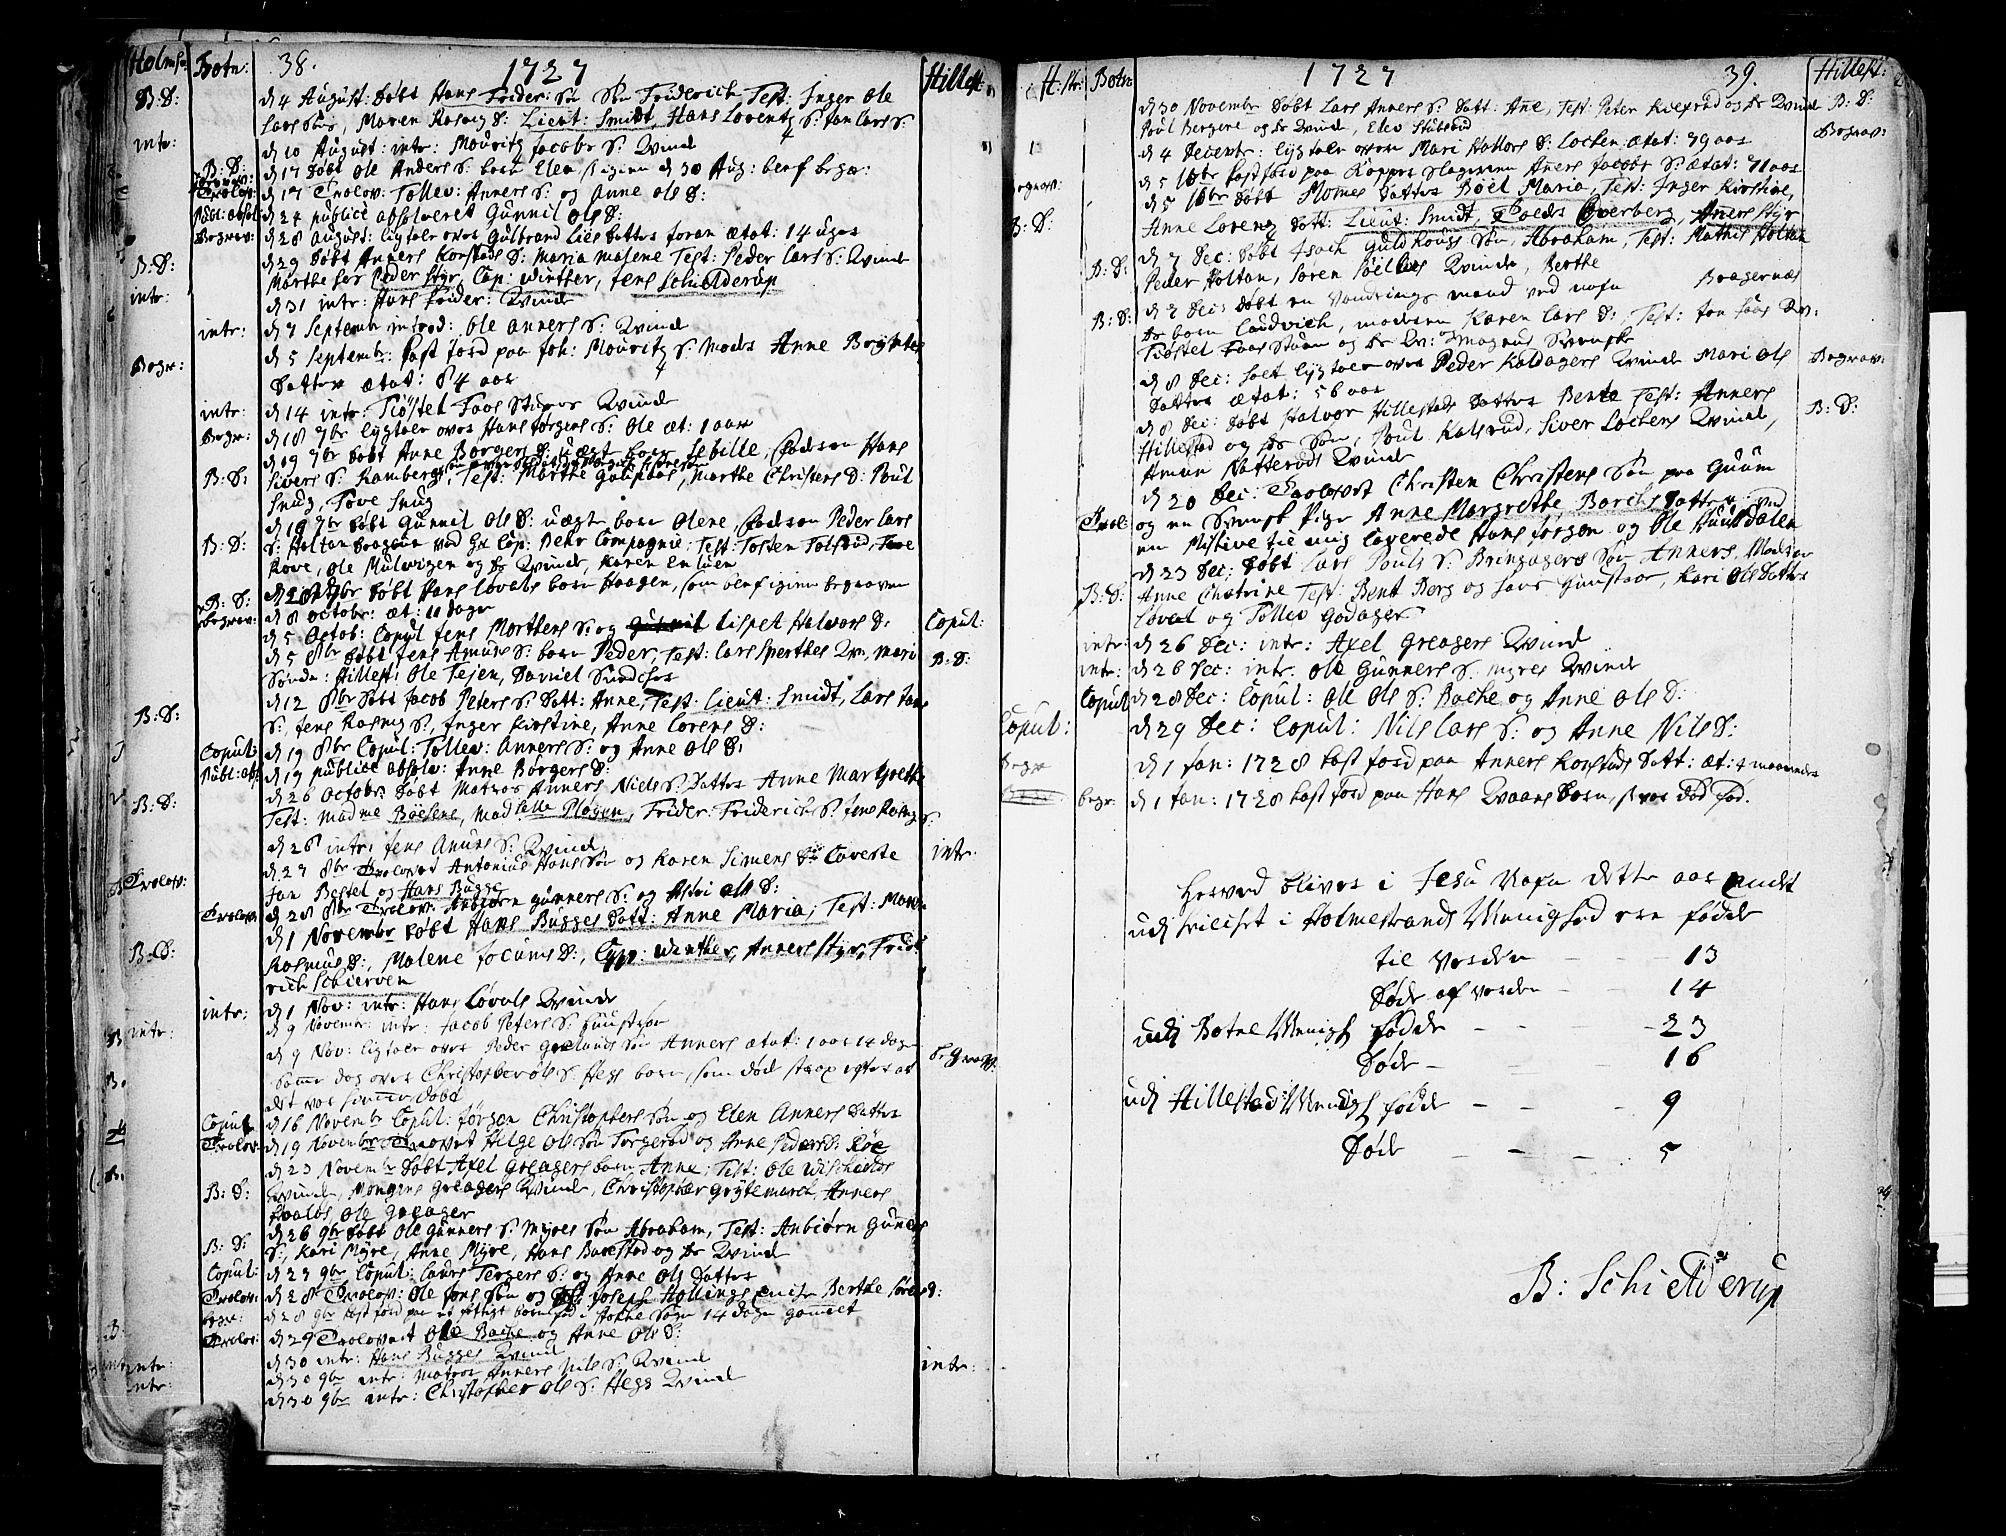 SAKO, Botne kirkebøker, F/Fa/L0001a: Ministerialbok nr. I 1A, 1707-1778, s. 38-39